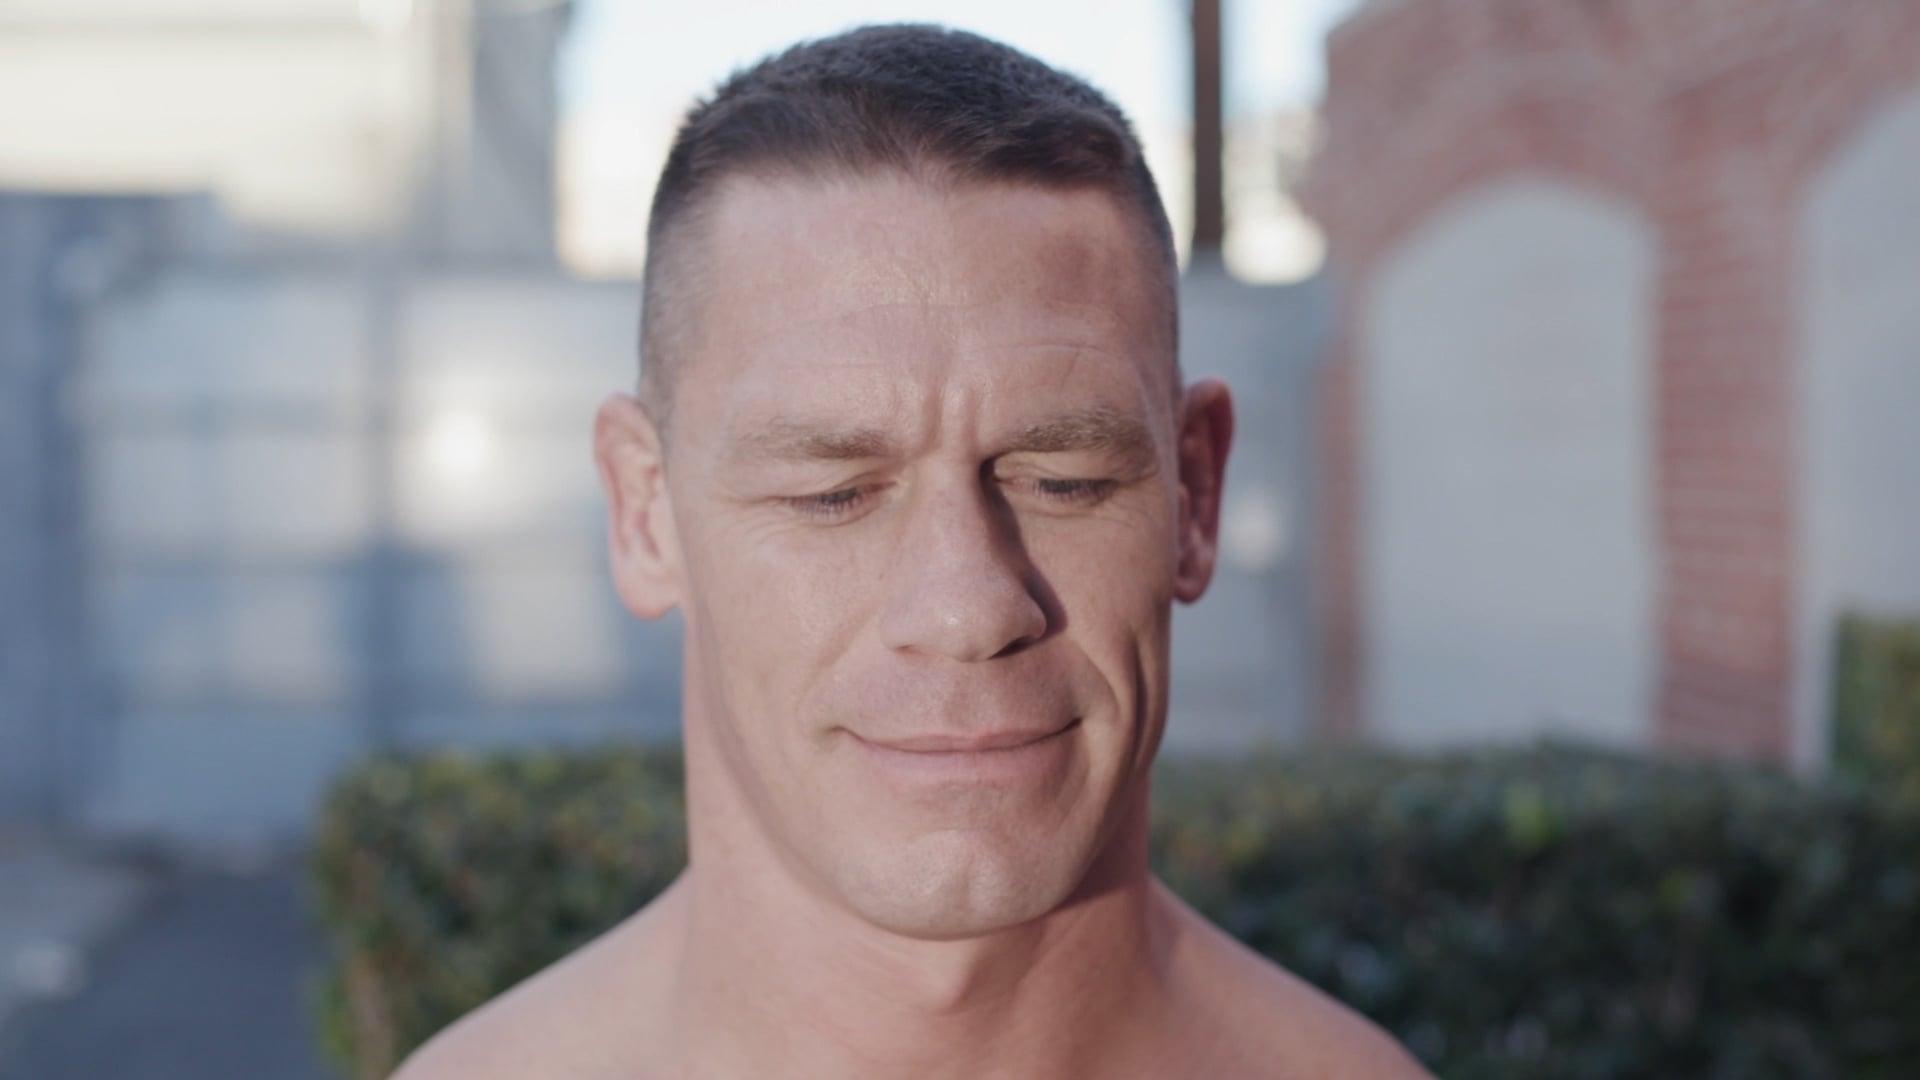 Blockr with John Cena - College Humor